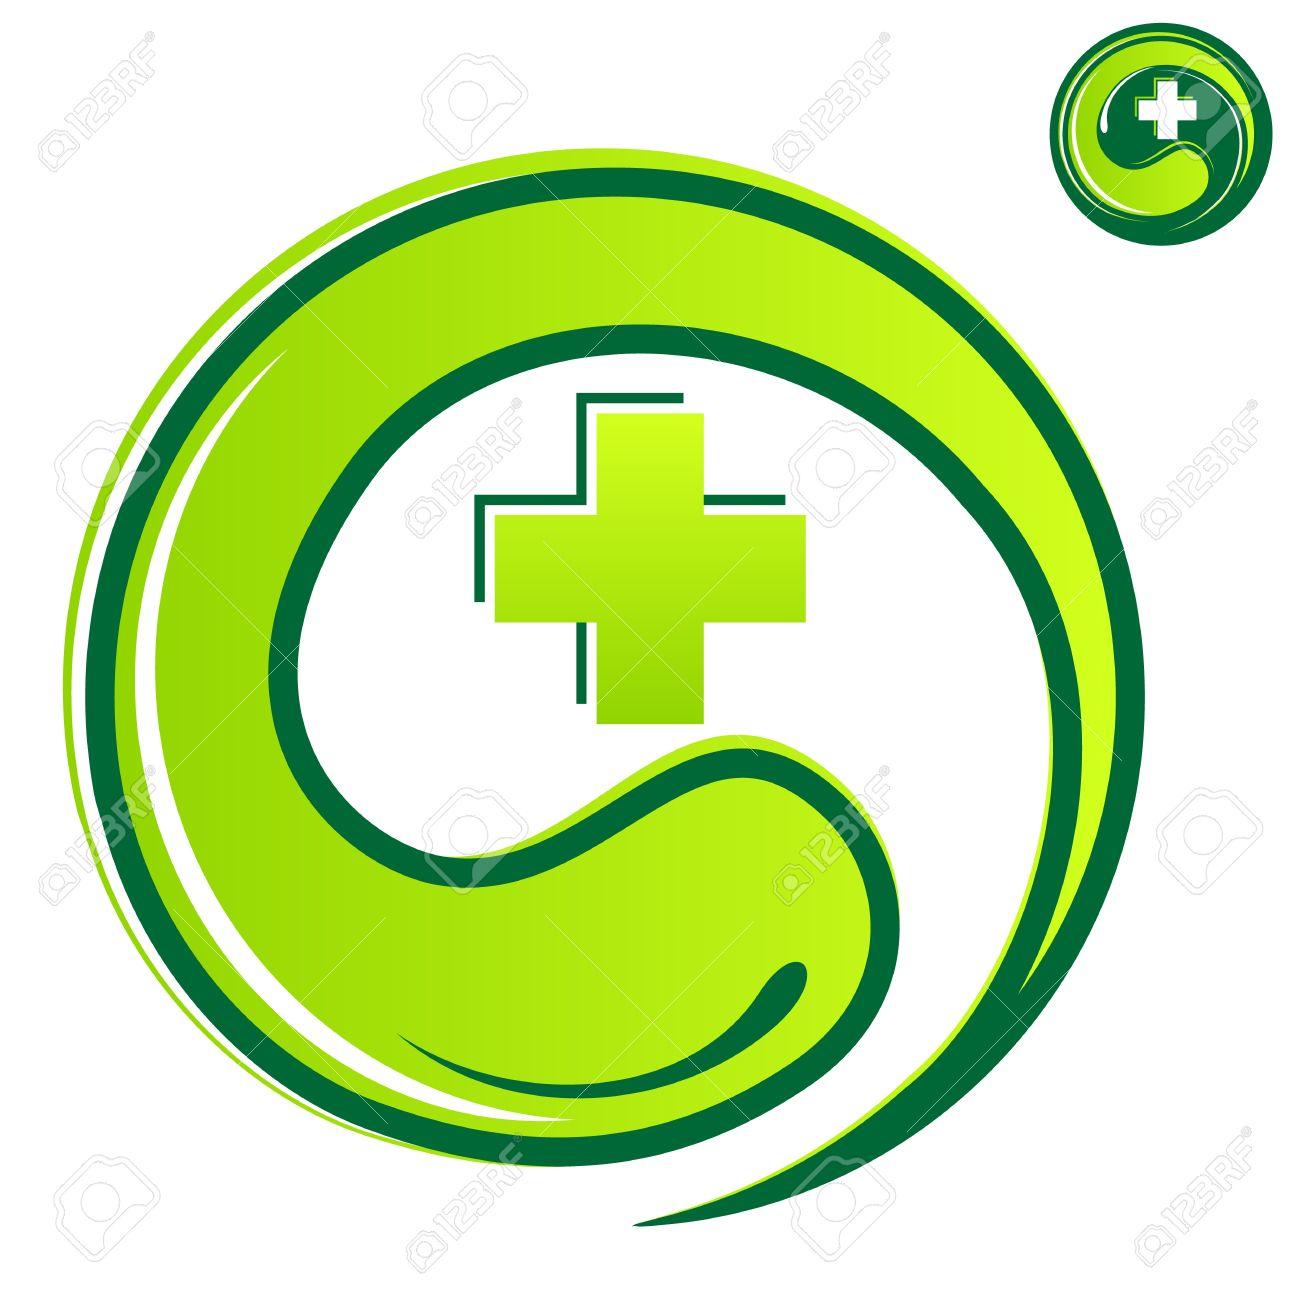 Alternative Medicine Concept.